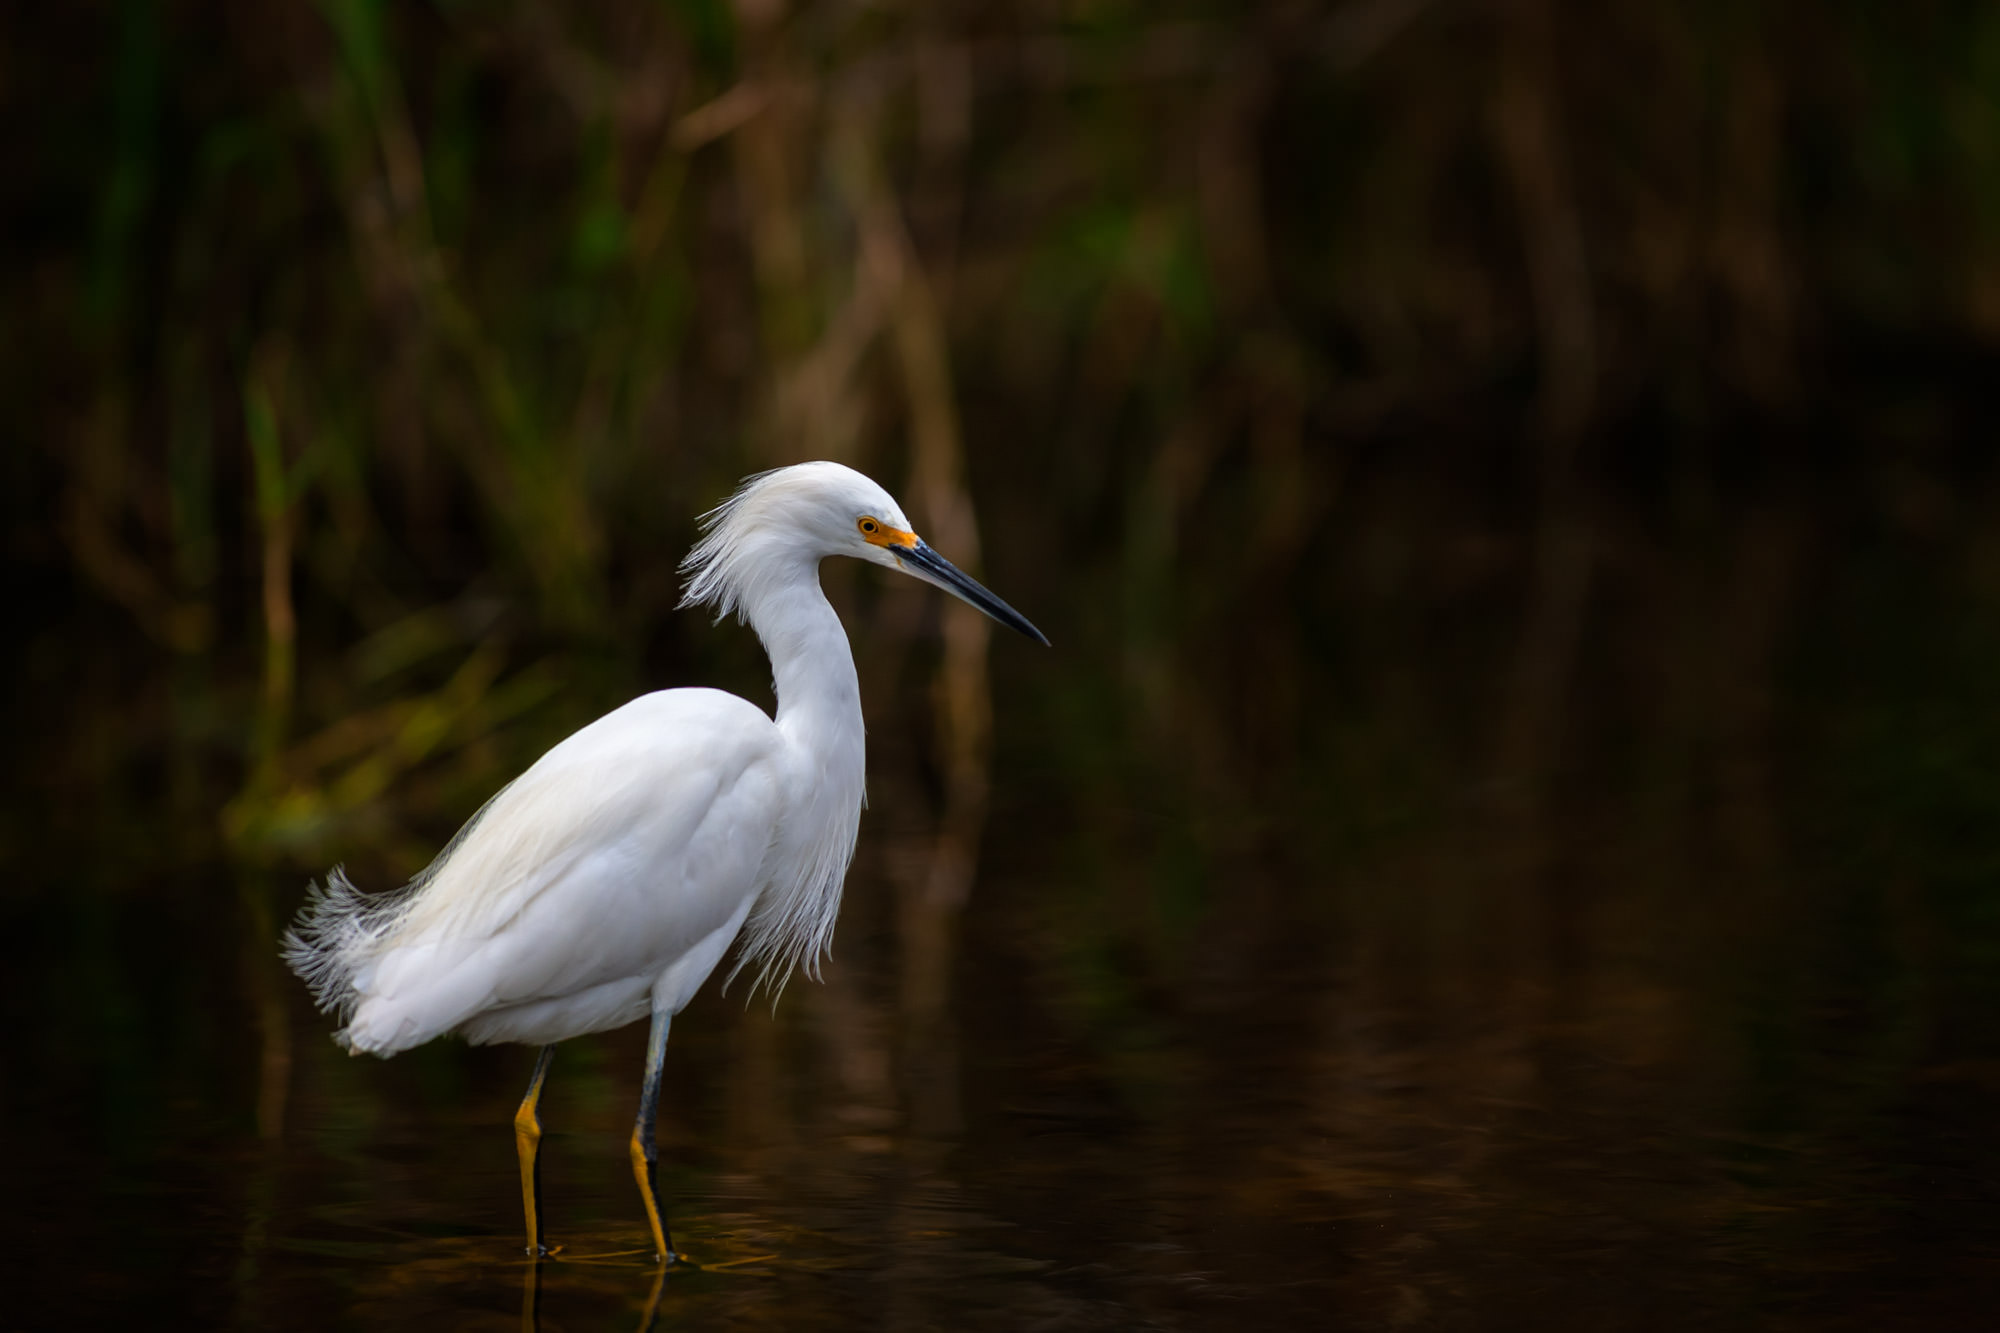 Egret, Snowy Egret, Florida, photo